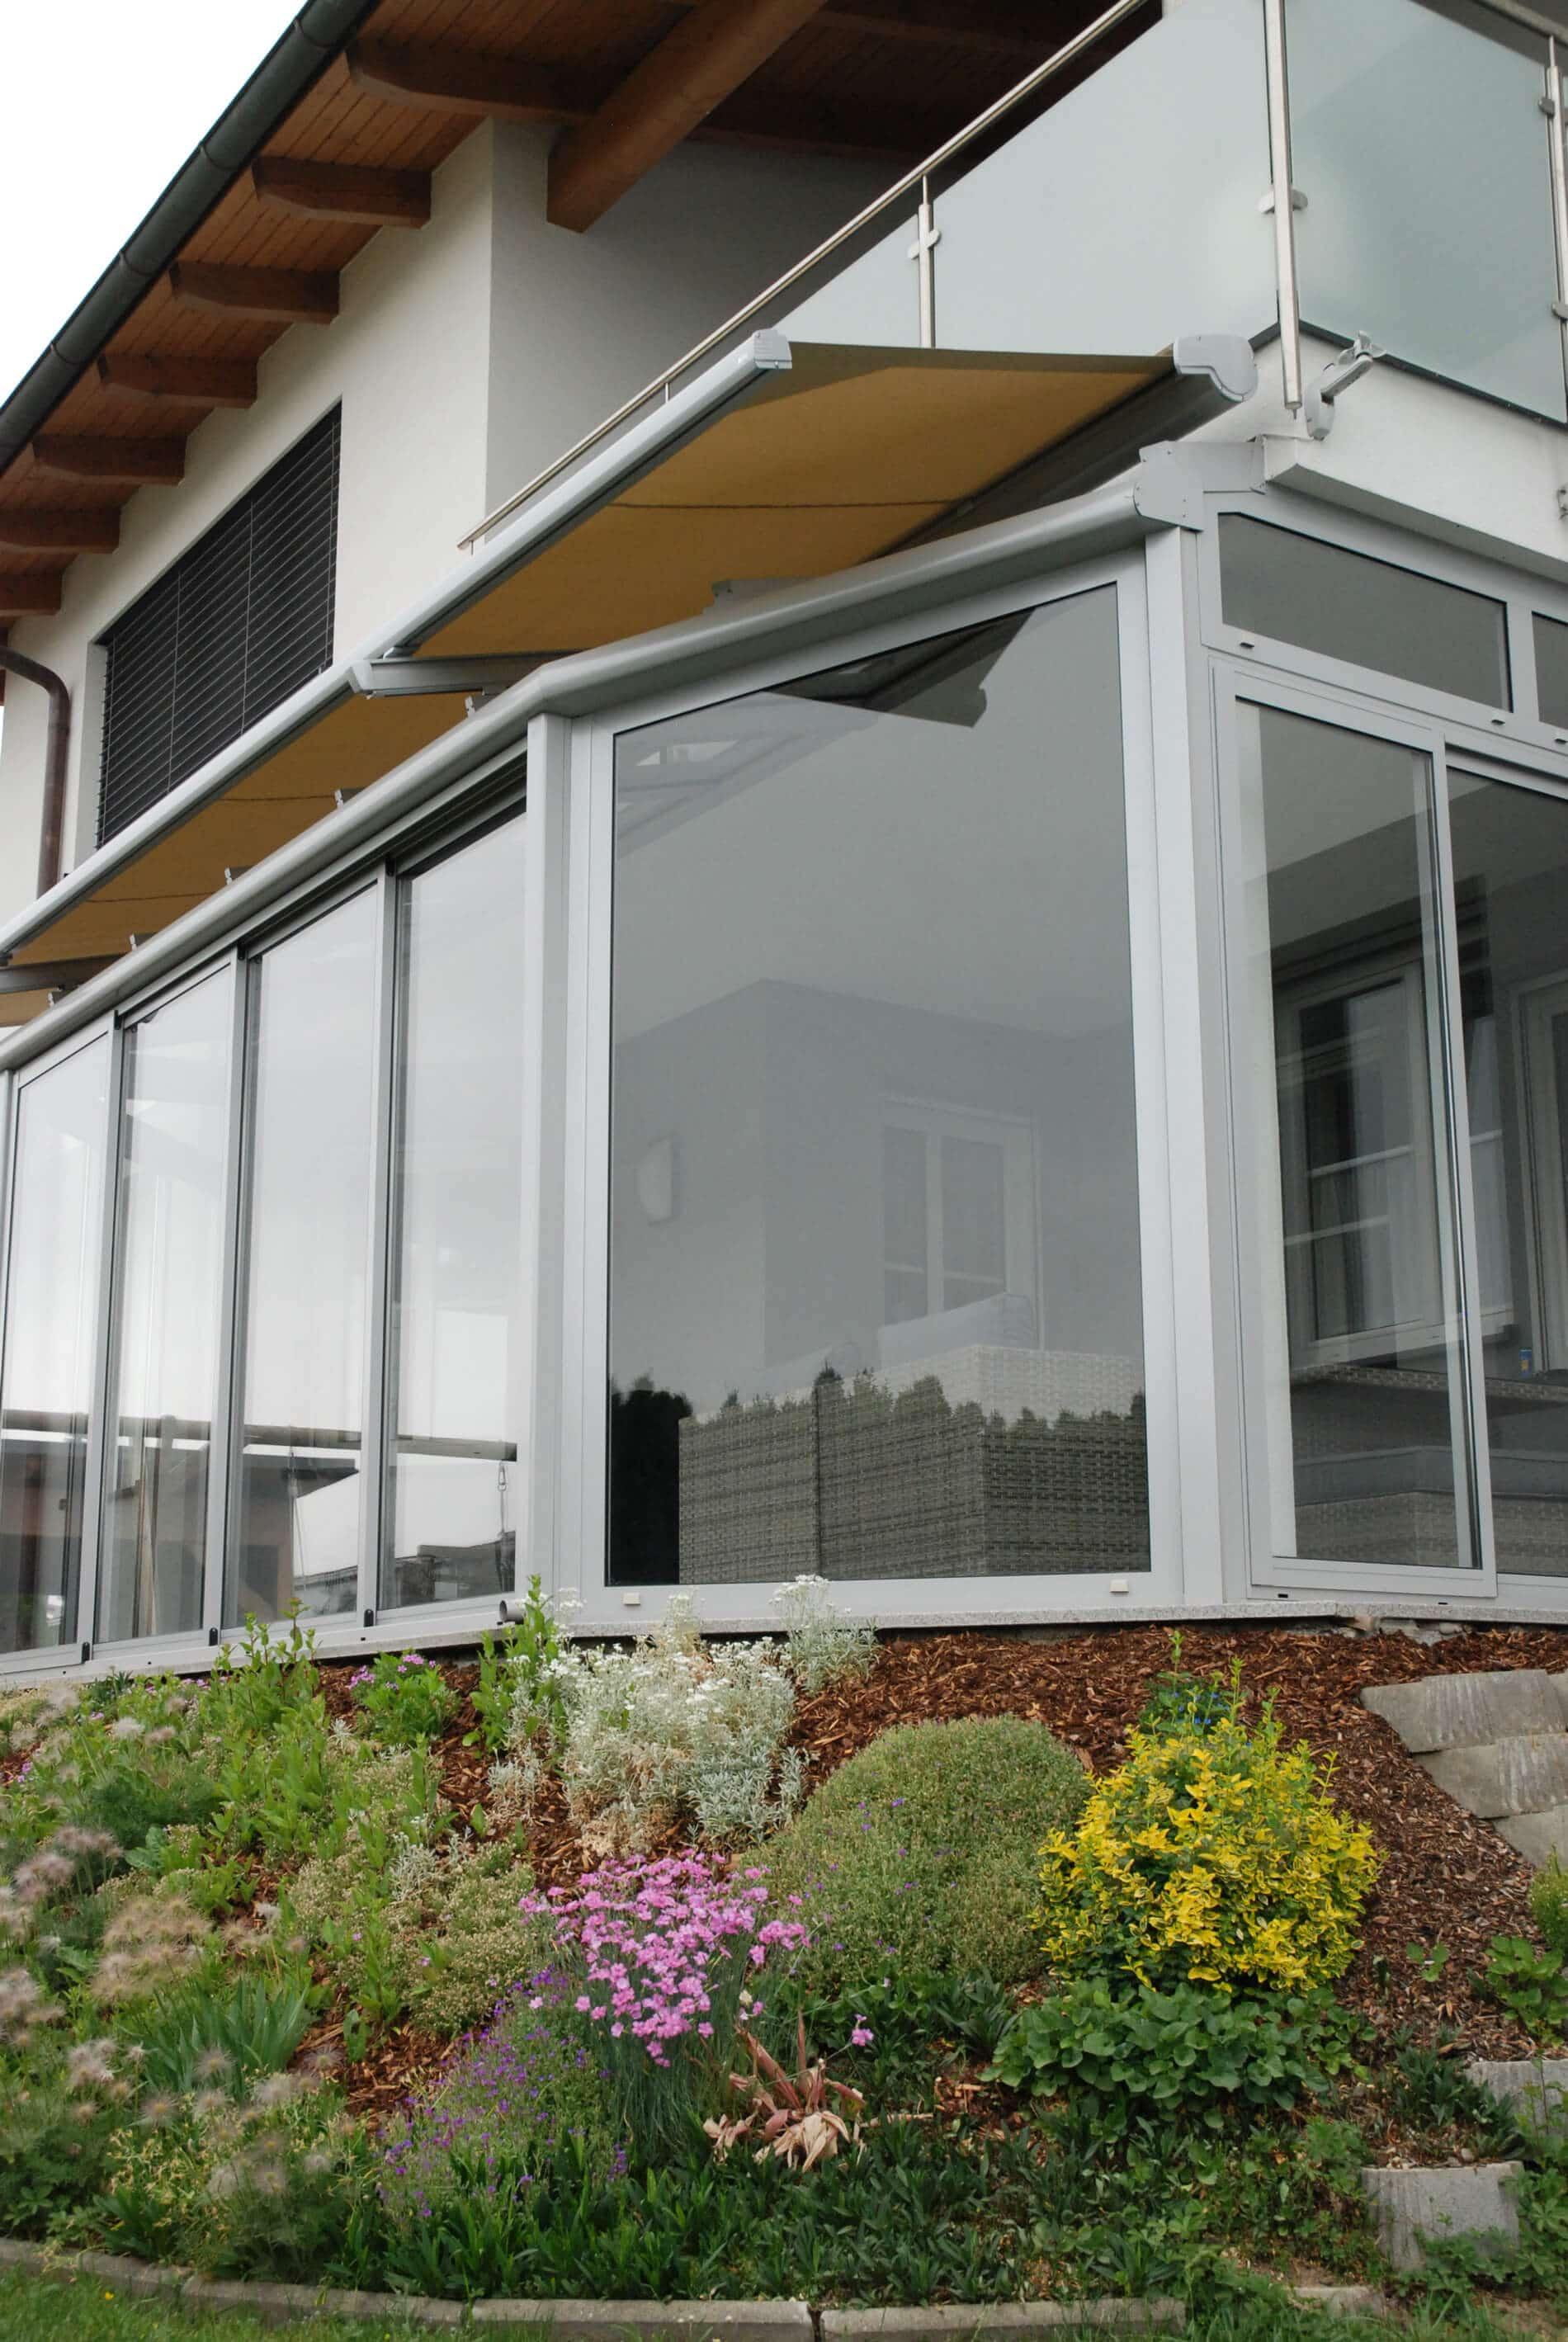 vordach mit windschutz f r hauseingang edelstahl glas. Black Bedroom Furniture Sets. Home Design Ideas